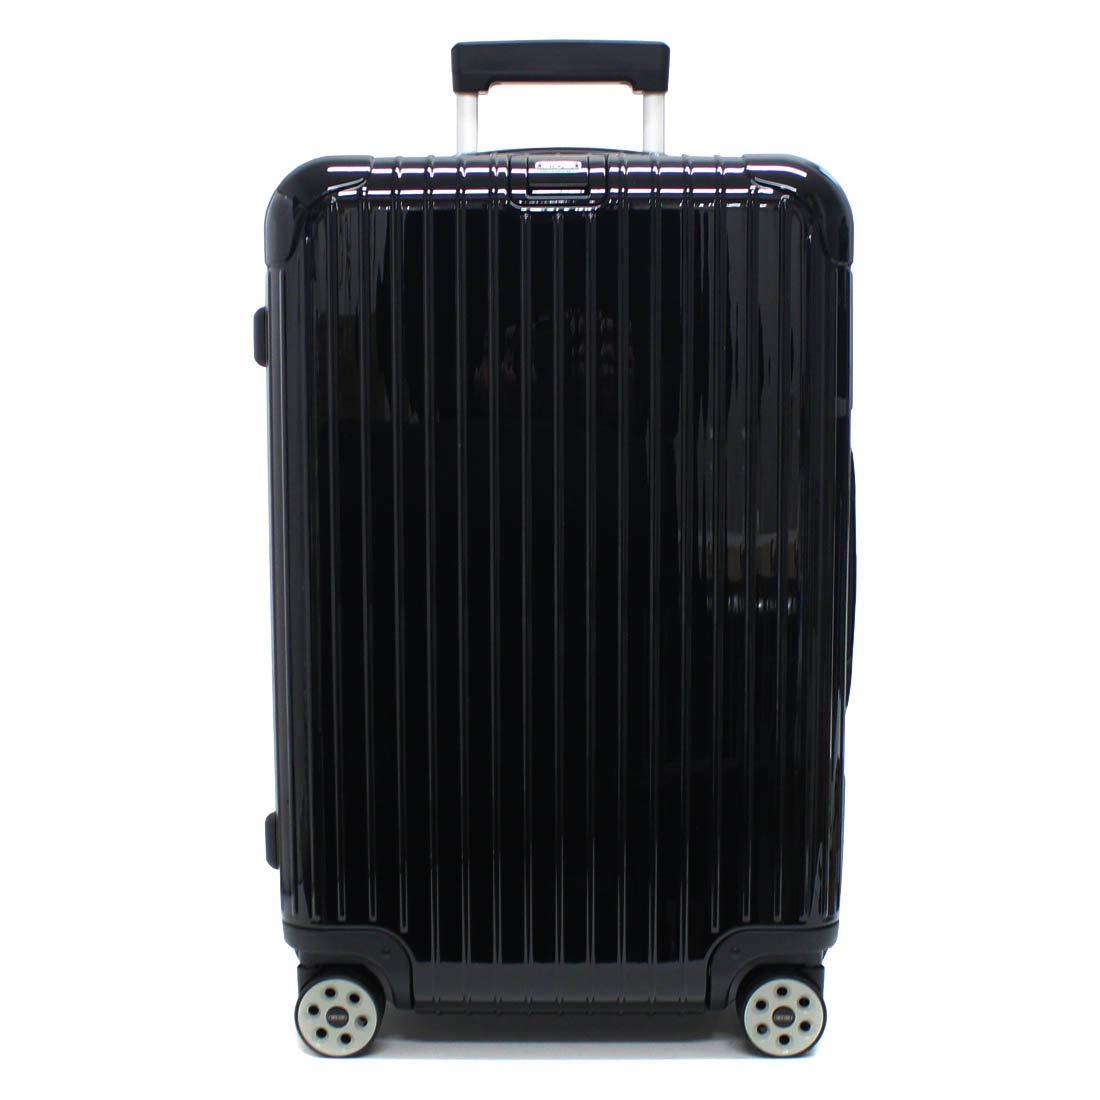 RIMOWA [ リモワ ] 【4輪】 サルサ デラックス 831.63.50.5 スーツケース マルチ 【Salsa Deluxe 】 Multiwheel ブラック 63L [並行輸入品]   B07QXP7FLR